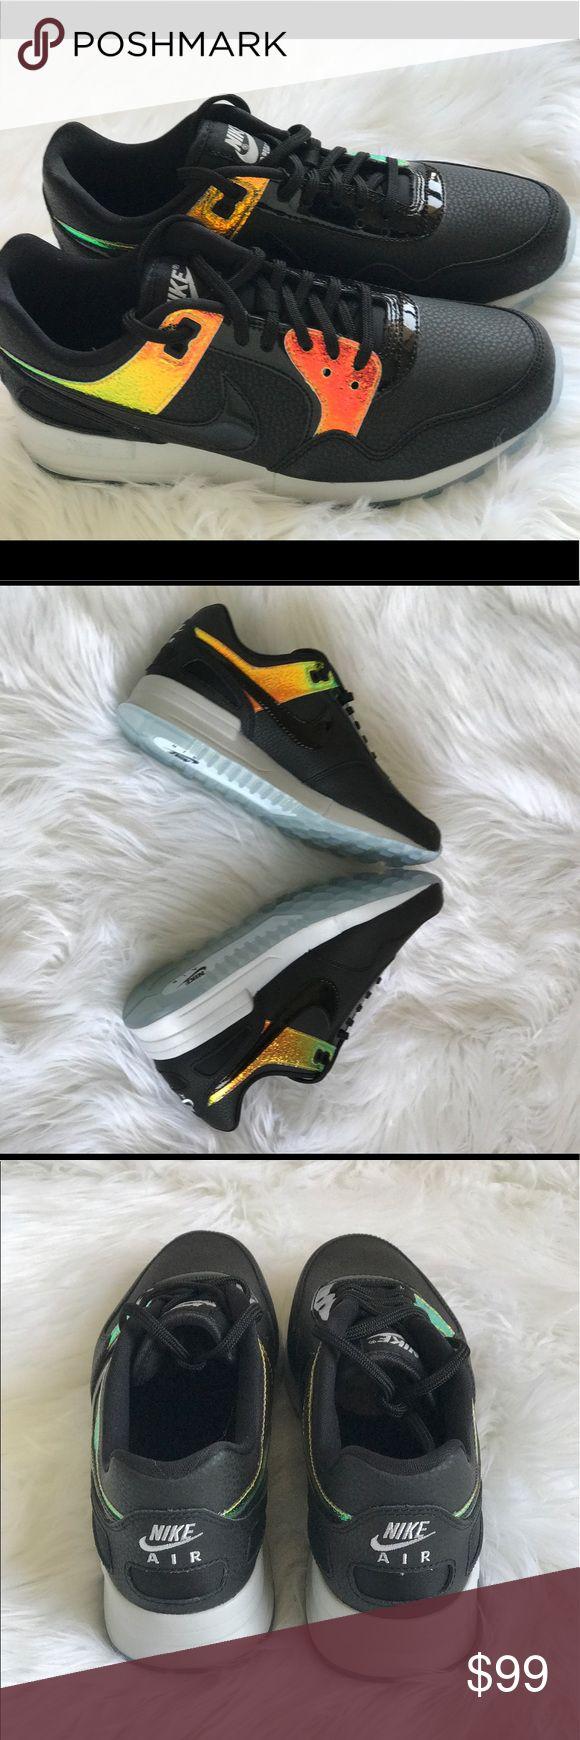 Nike Air Pegasus '89 - Black/Platinum Brand new out of box Nike Pegasus '89s - size 7. Nike Shoes Sneakers